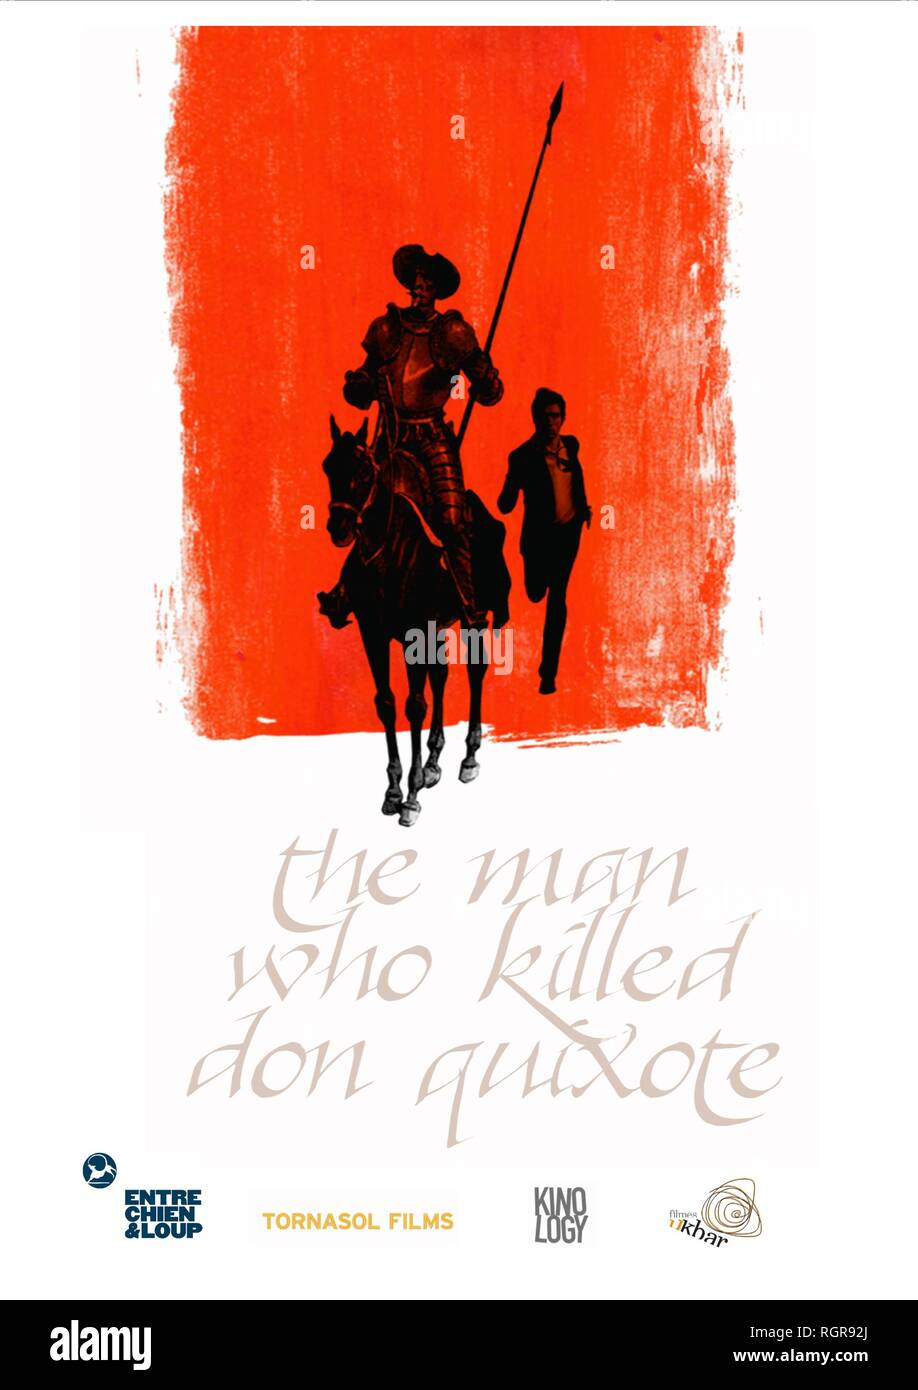 MOVIE POSTER THE MAN WHO KILLED DON QUIXOTE (2018) - Stock Image